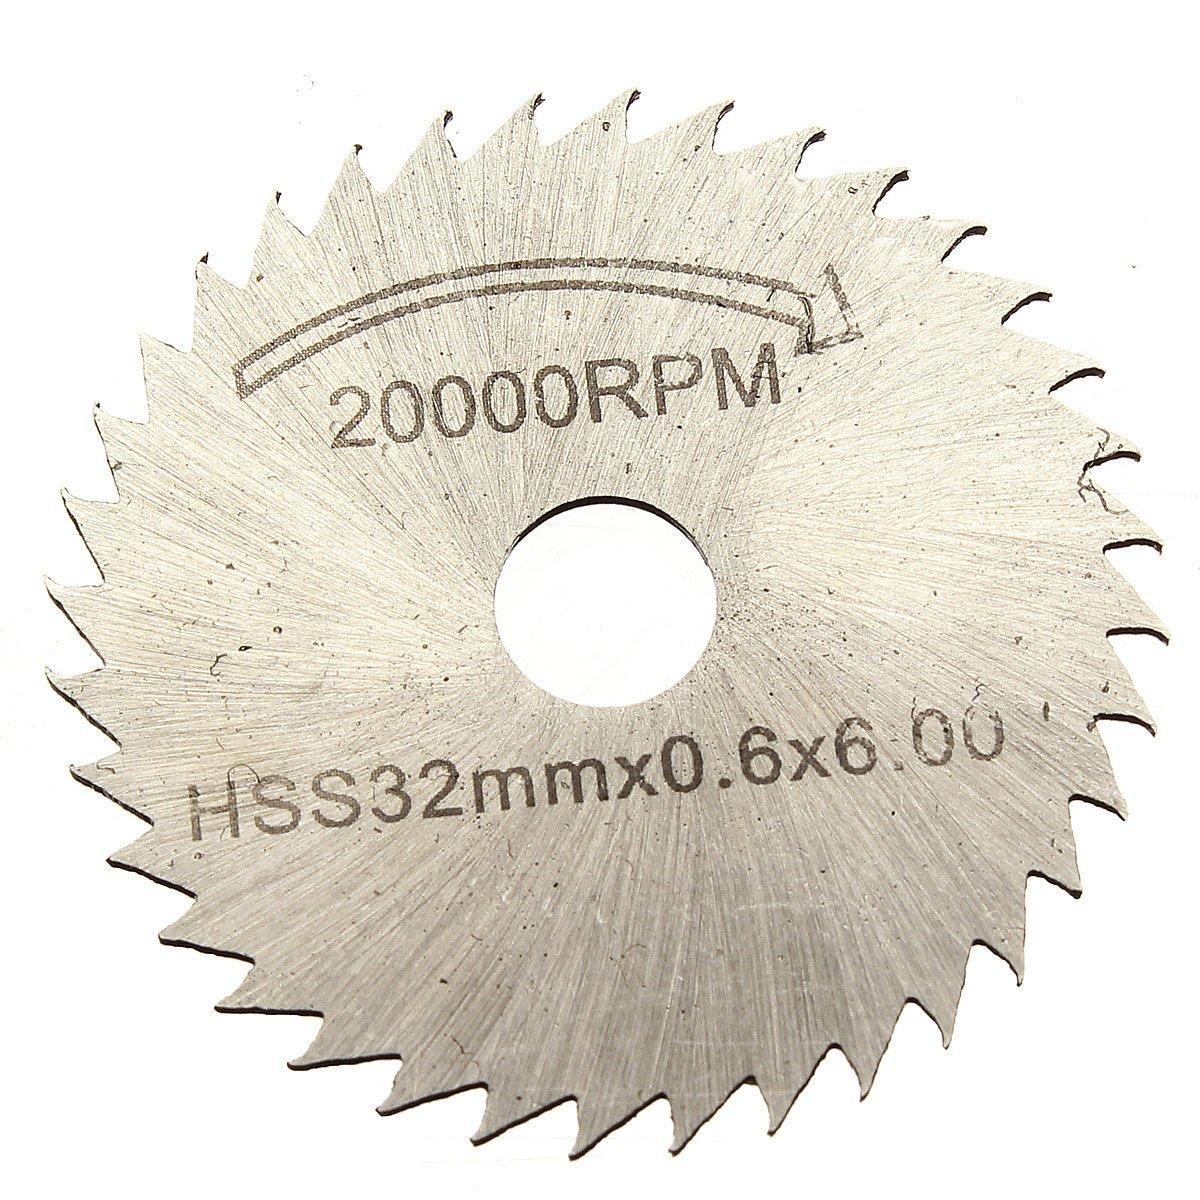 Top Quality Kits Of 6 Pcs HSS Saw Blade Circular Drive Decoupe Dent For Dremel Rotary Tool